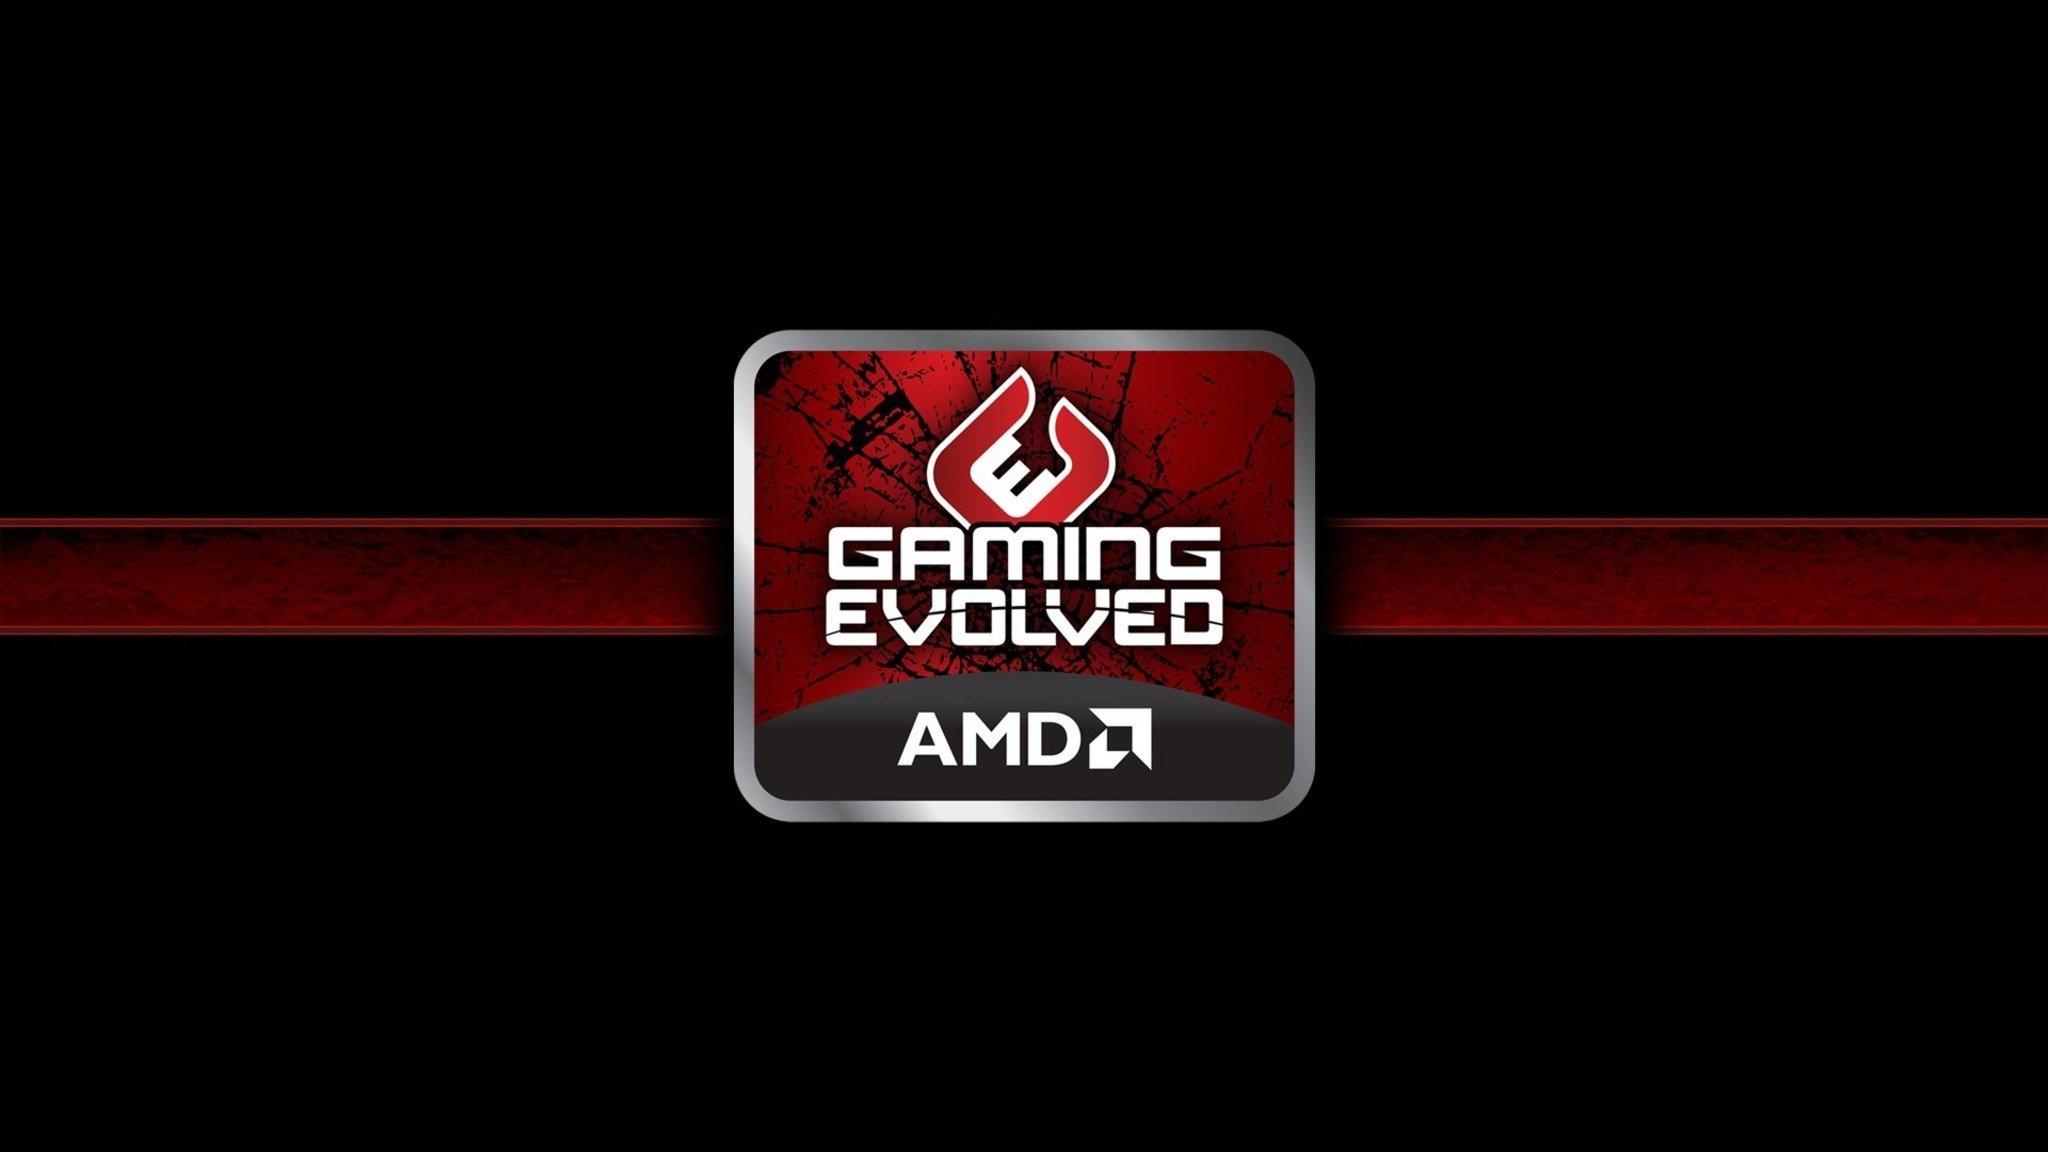 AMD Wallpaper 1920x1080 (86+ images)